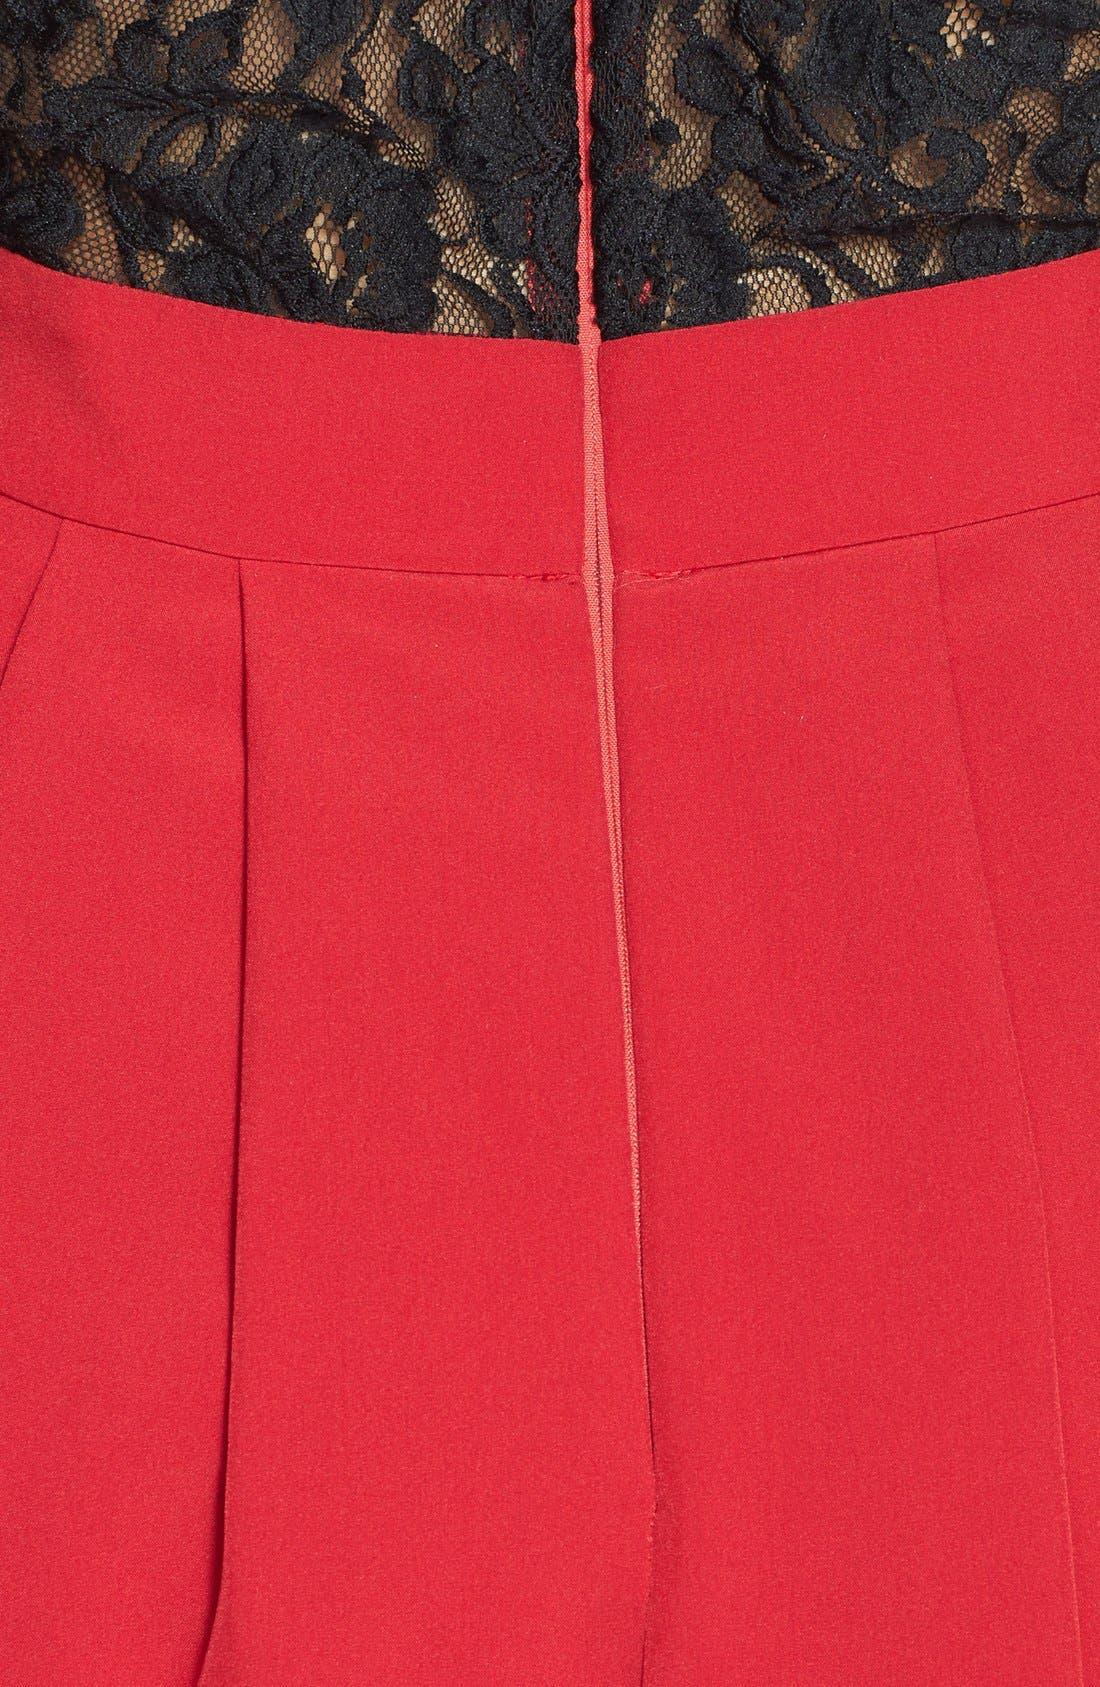 Alternate Image 3  - a. drea Lace Back Fit & Flare Dress (Juniors)